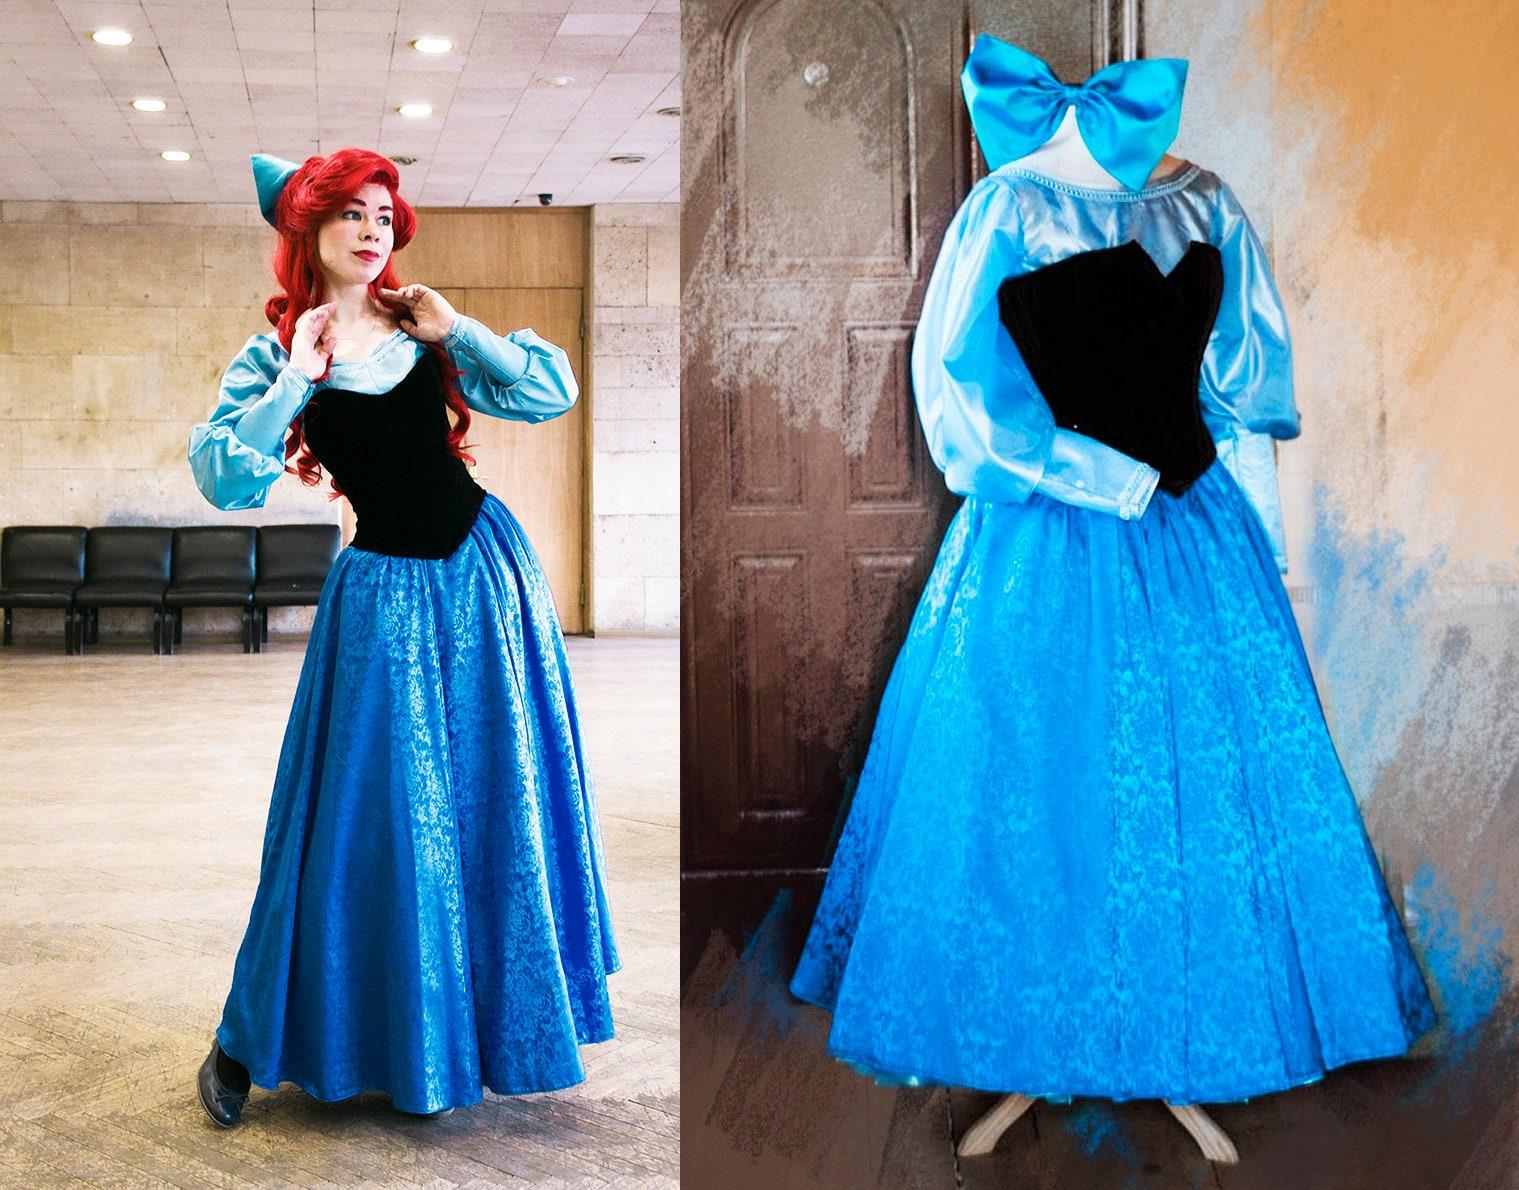 d4b541ebfa0 Ariel blue dress Cosplay Disney Princess Halloween costume for Adult